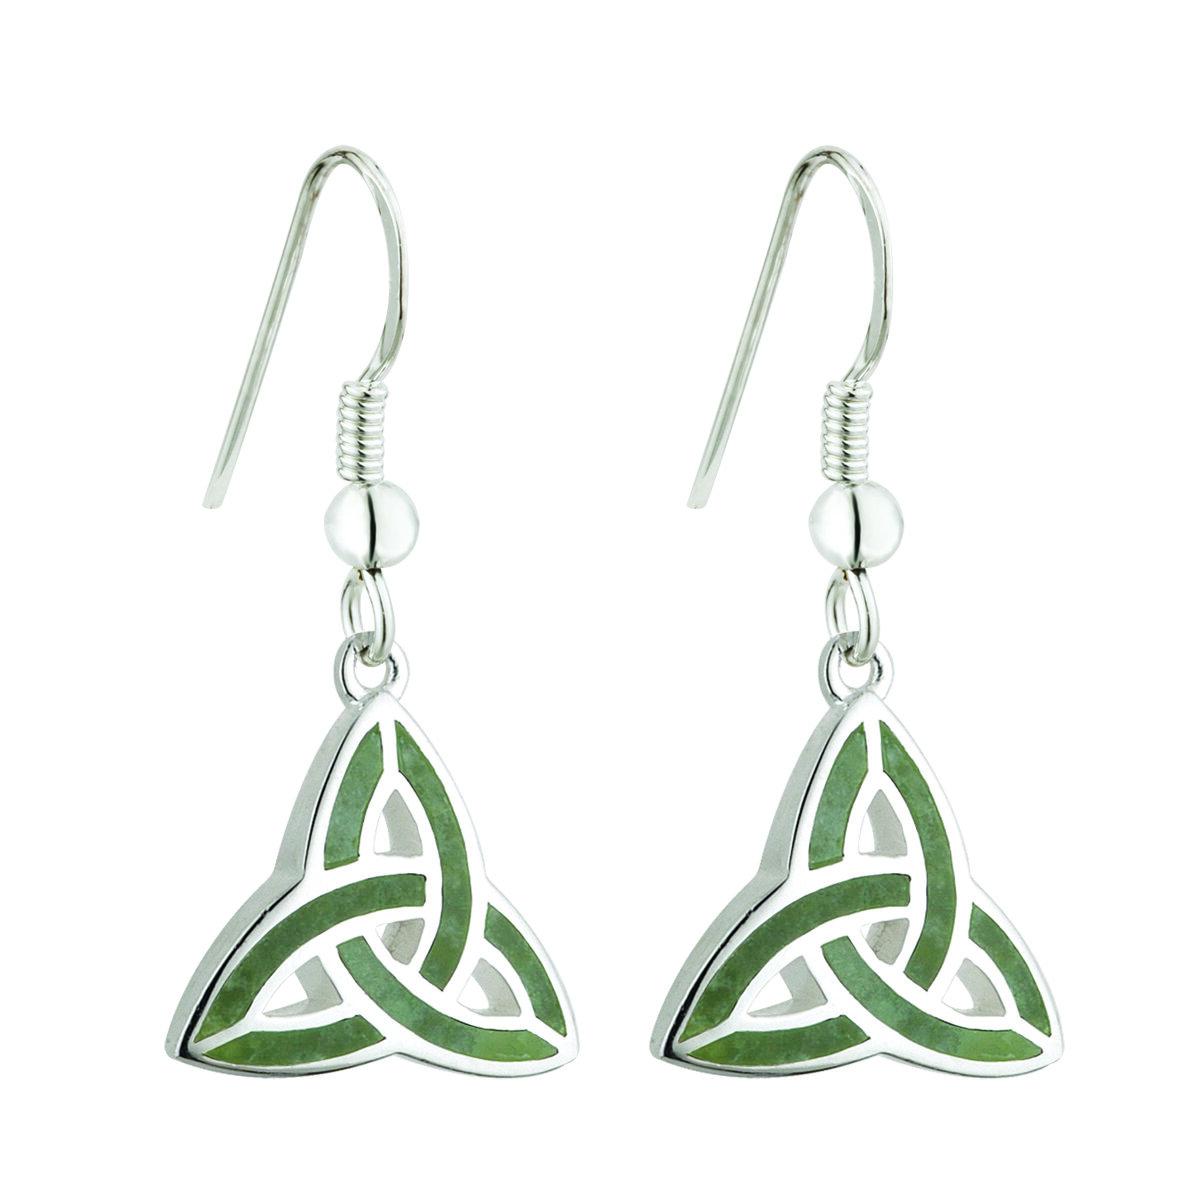 sterling silver connemara marble trinity knot drop earrings s33301 from Solvar